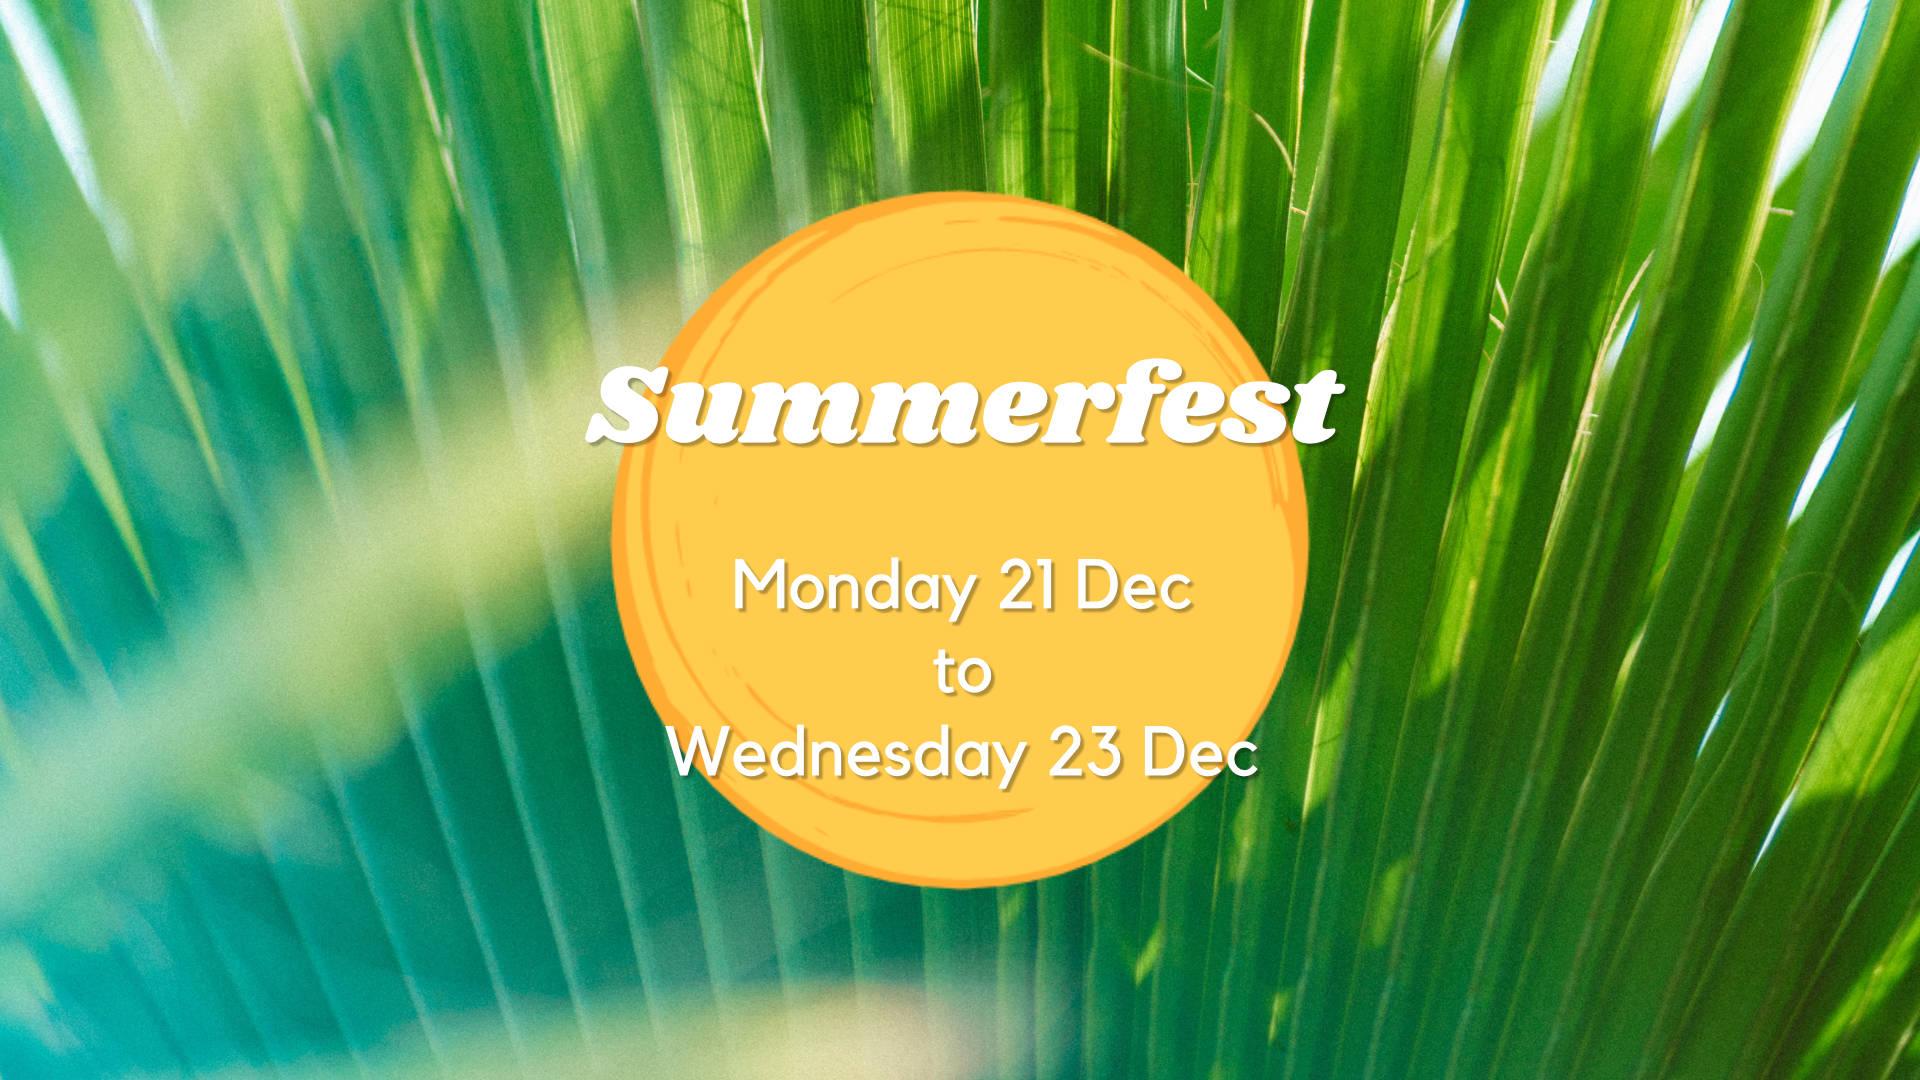 Summerfest Monday 21 Dec to Wednesday 23 Dec